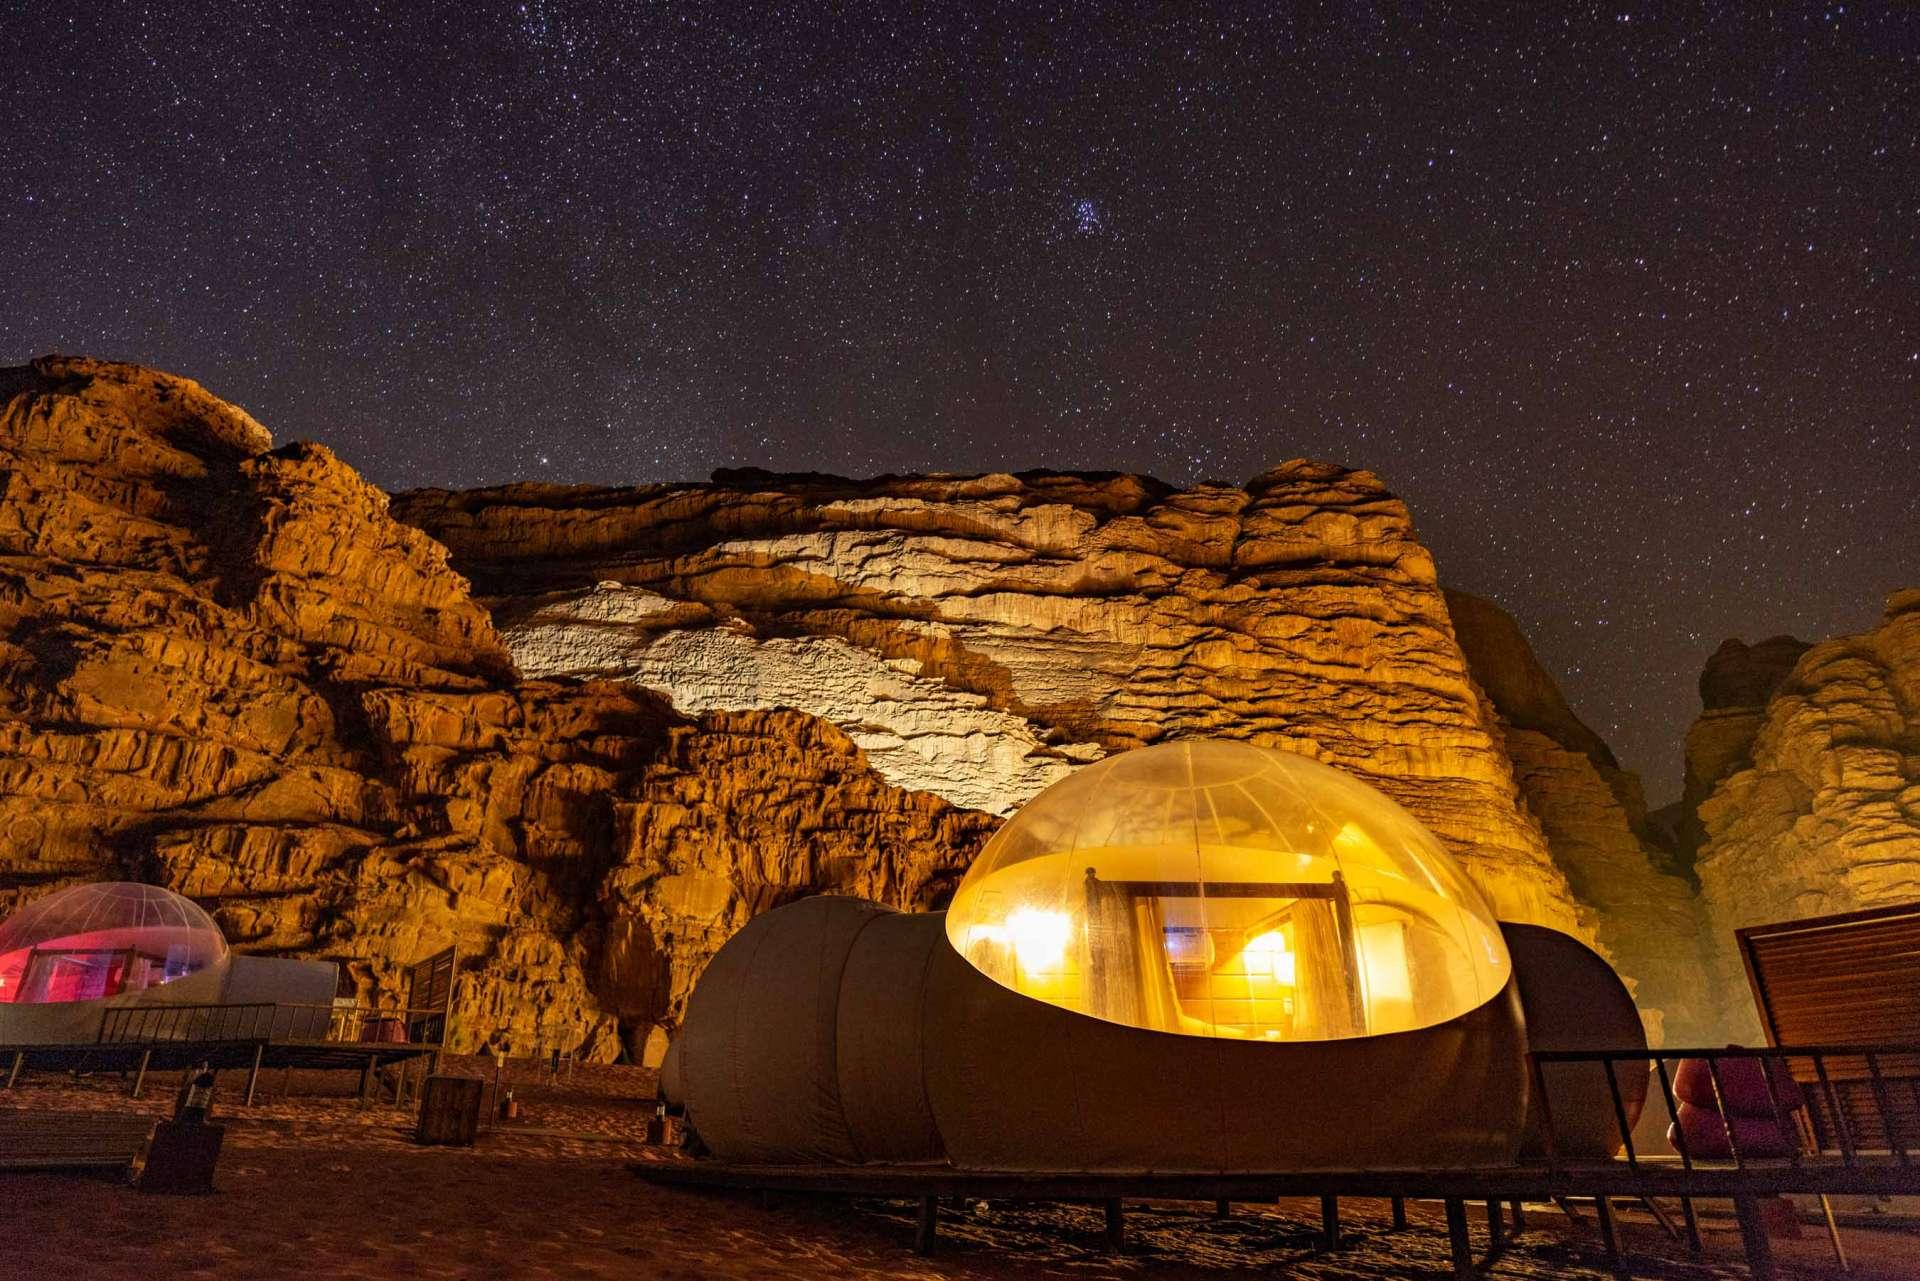 Wadi Rum Night Luxury Camp Full of Stars tent Jordan Enrico Pescantini 6